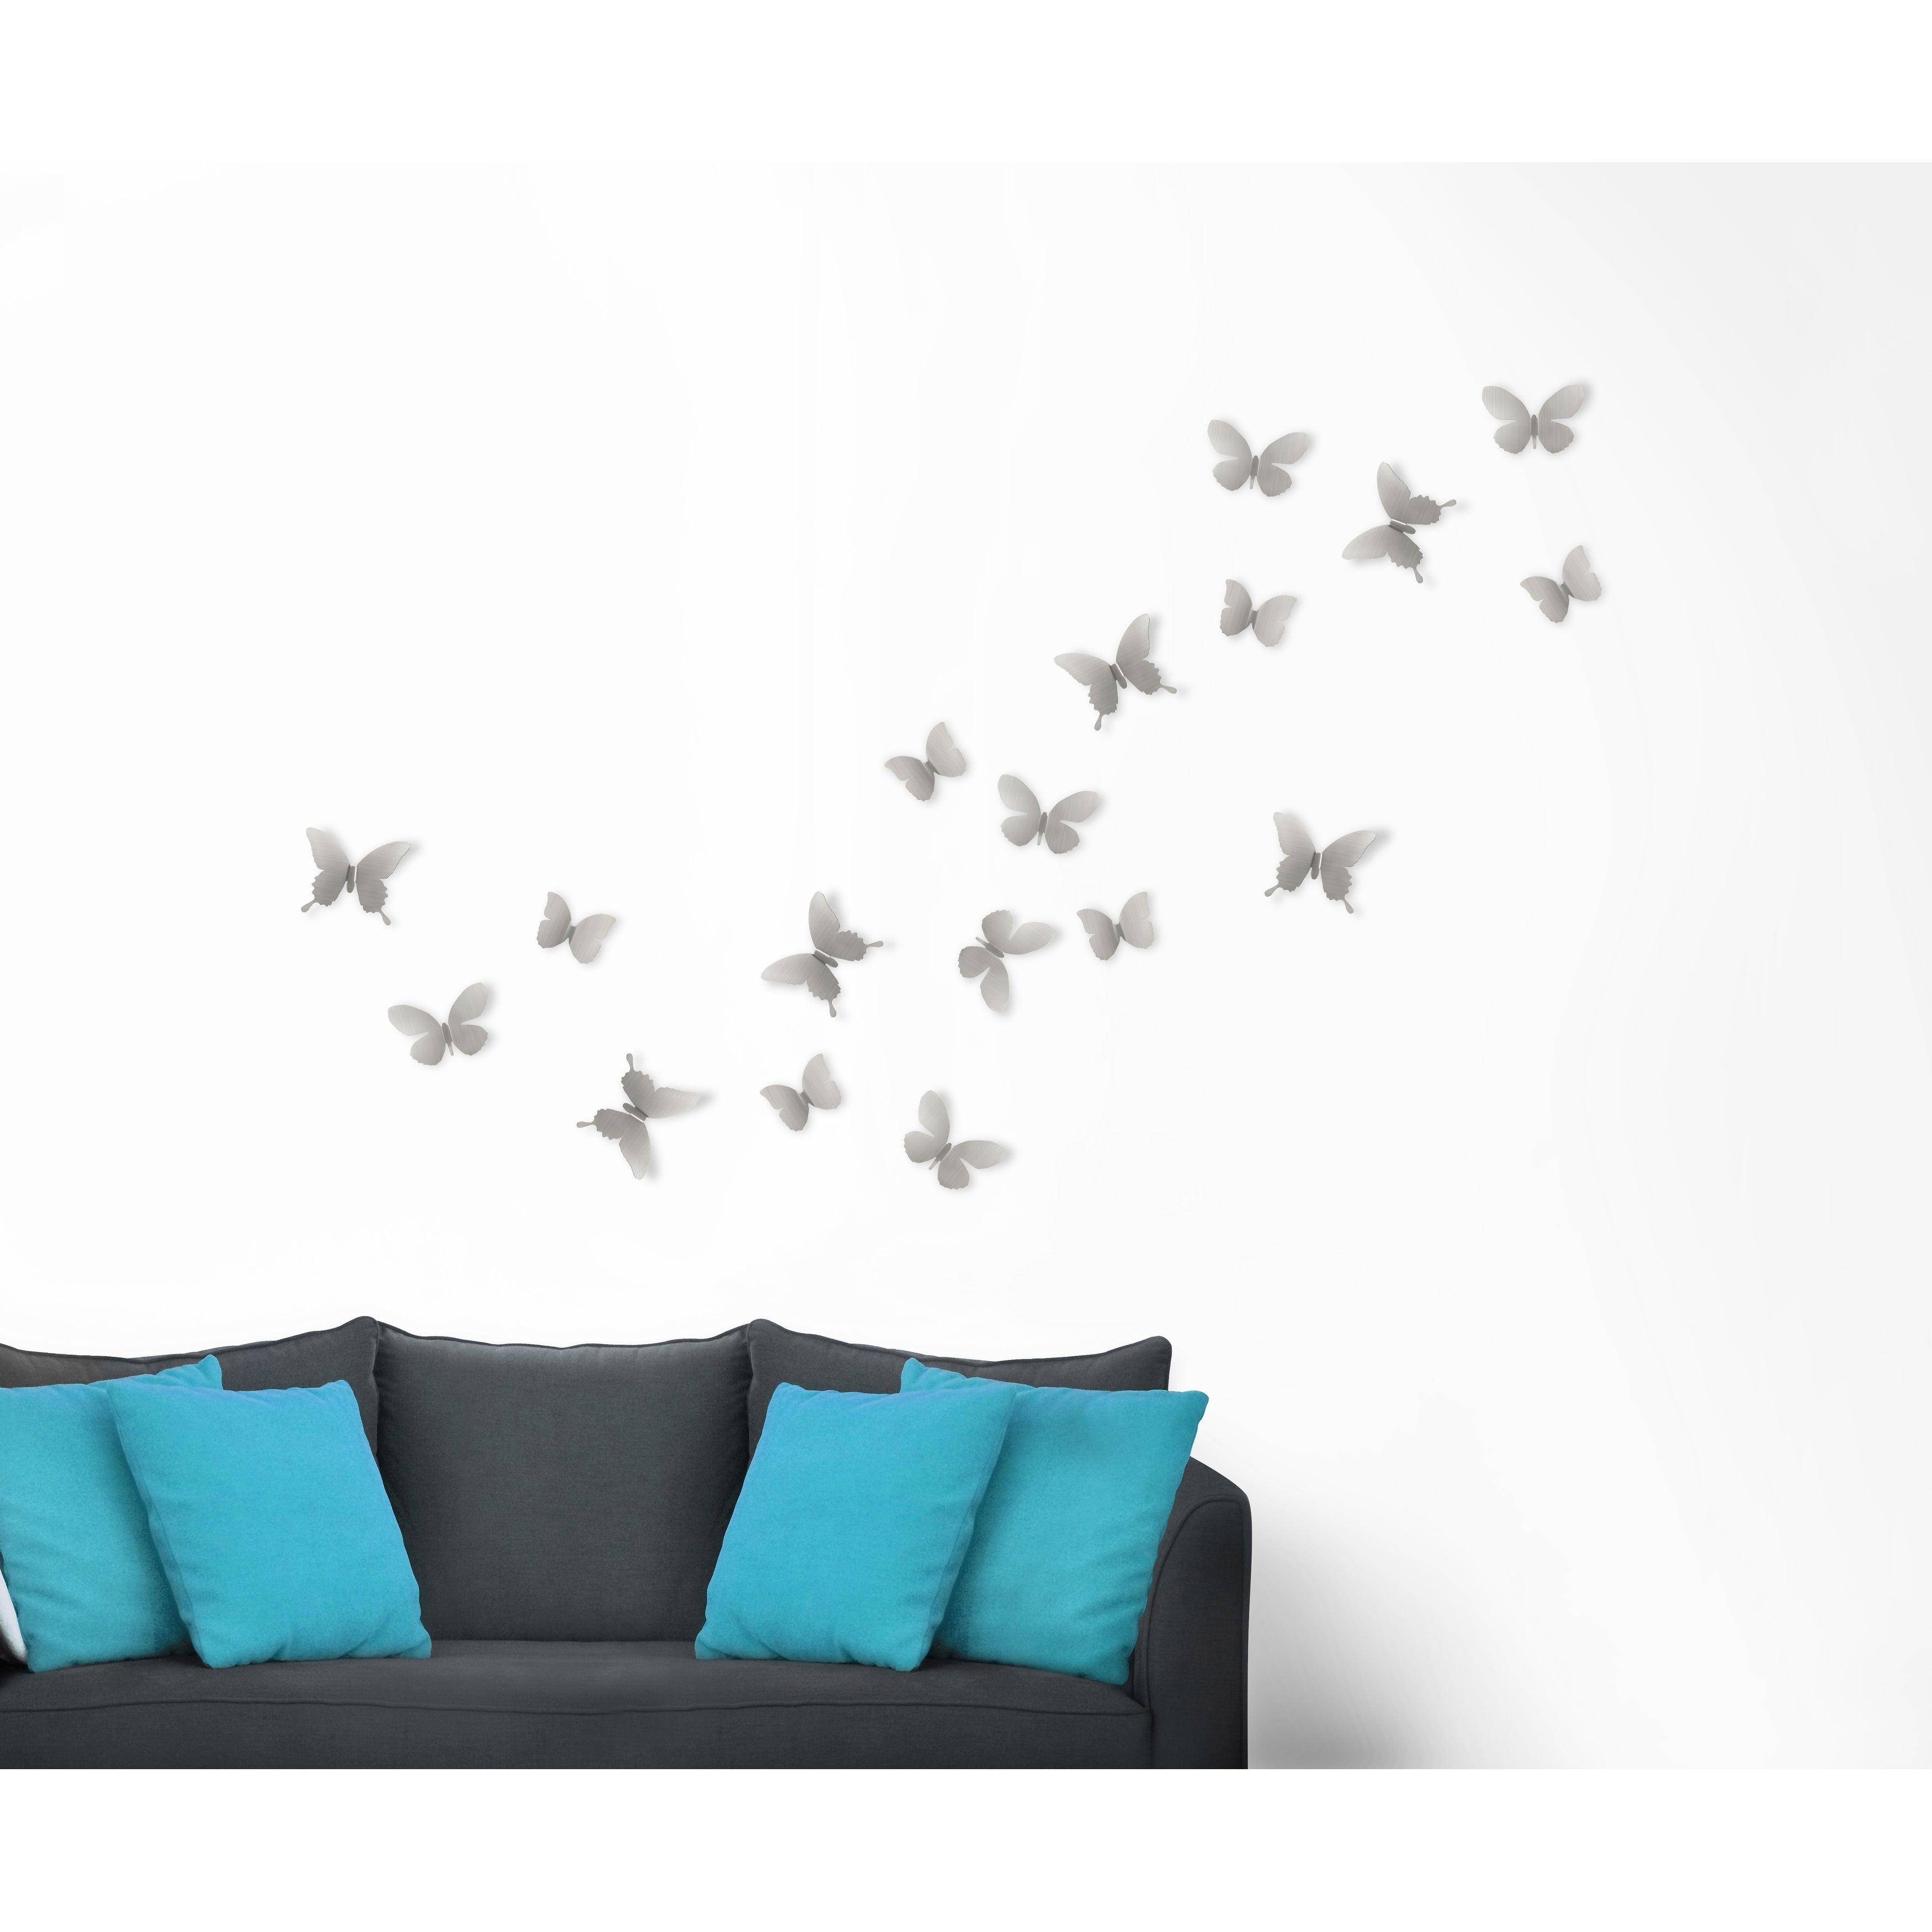 Umbra Mariposa Metal Wall Decor (Set Of 9) throughout Mariposa 9 Piece Wall Decor (Image 25 of 30)